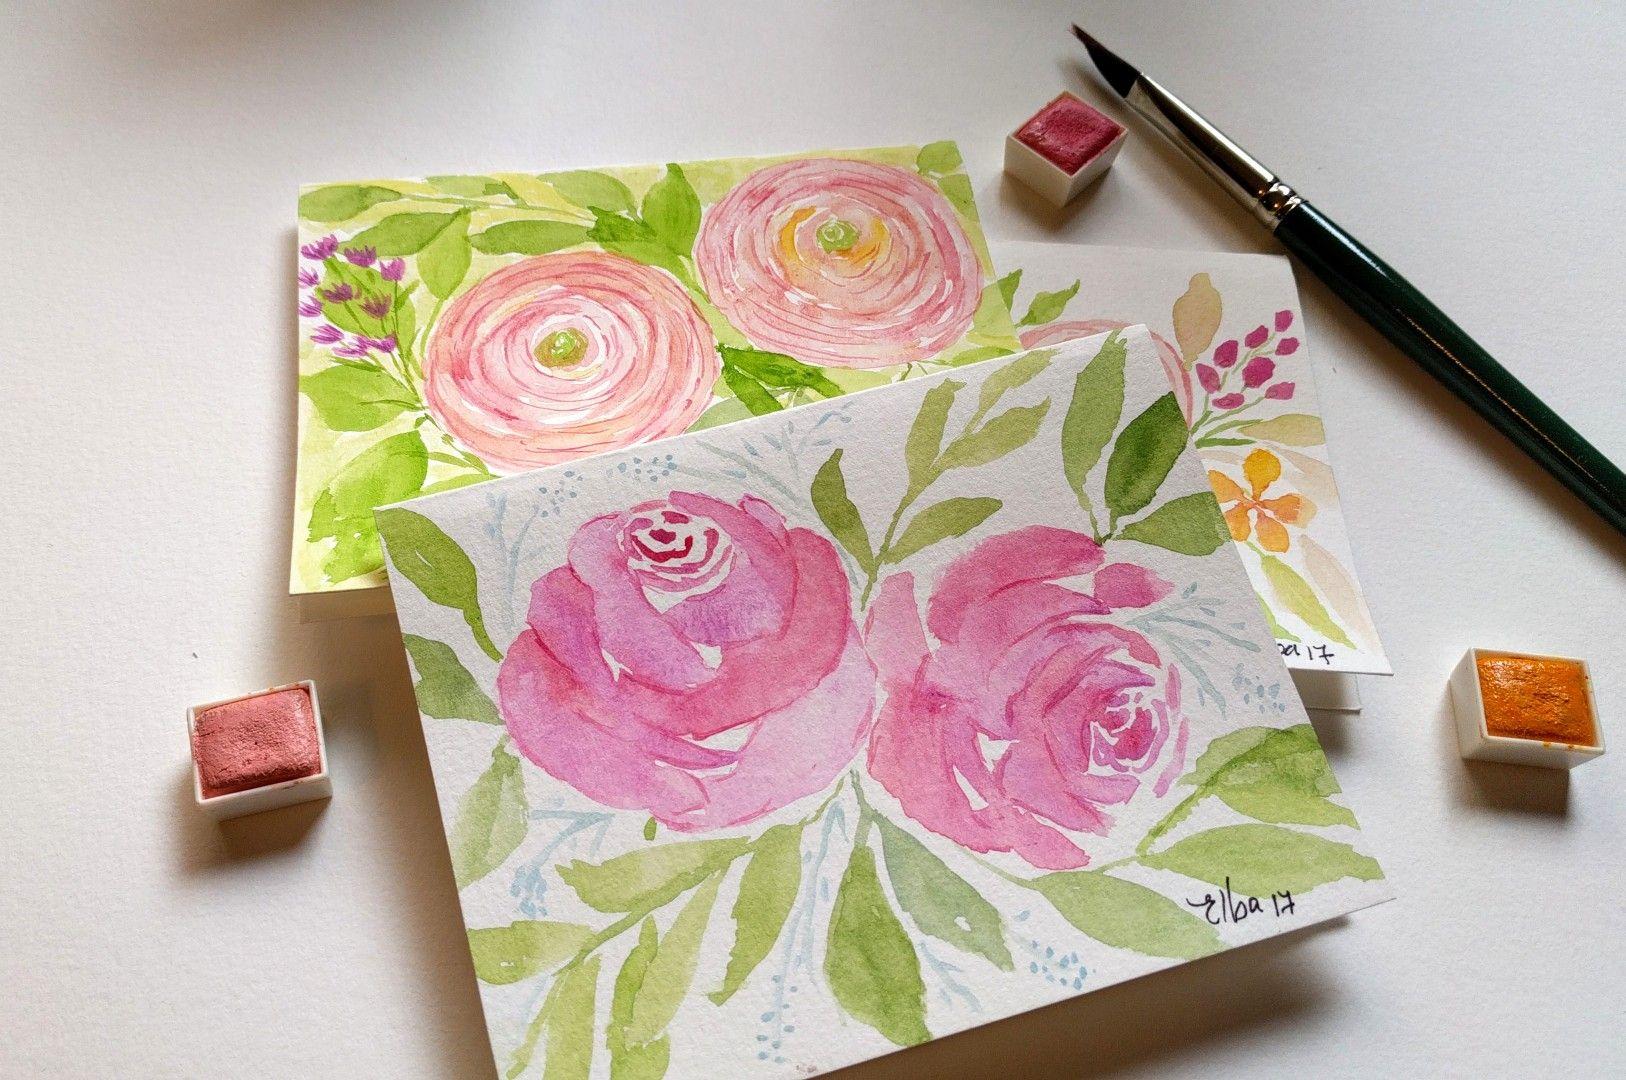 Loose watercolor flowers.  Elbaquarella on Instagram.